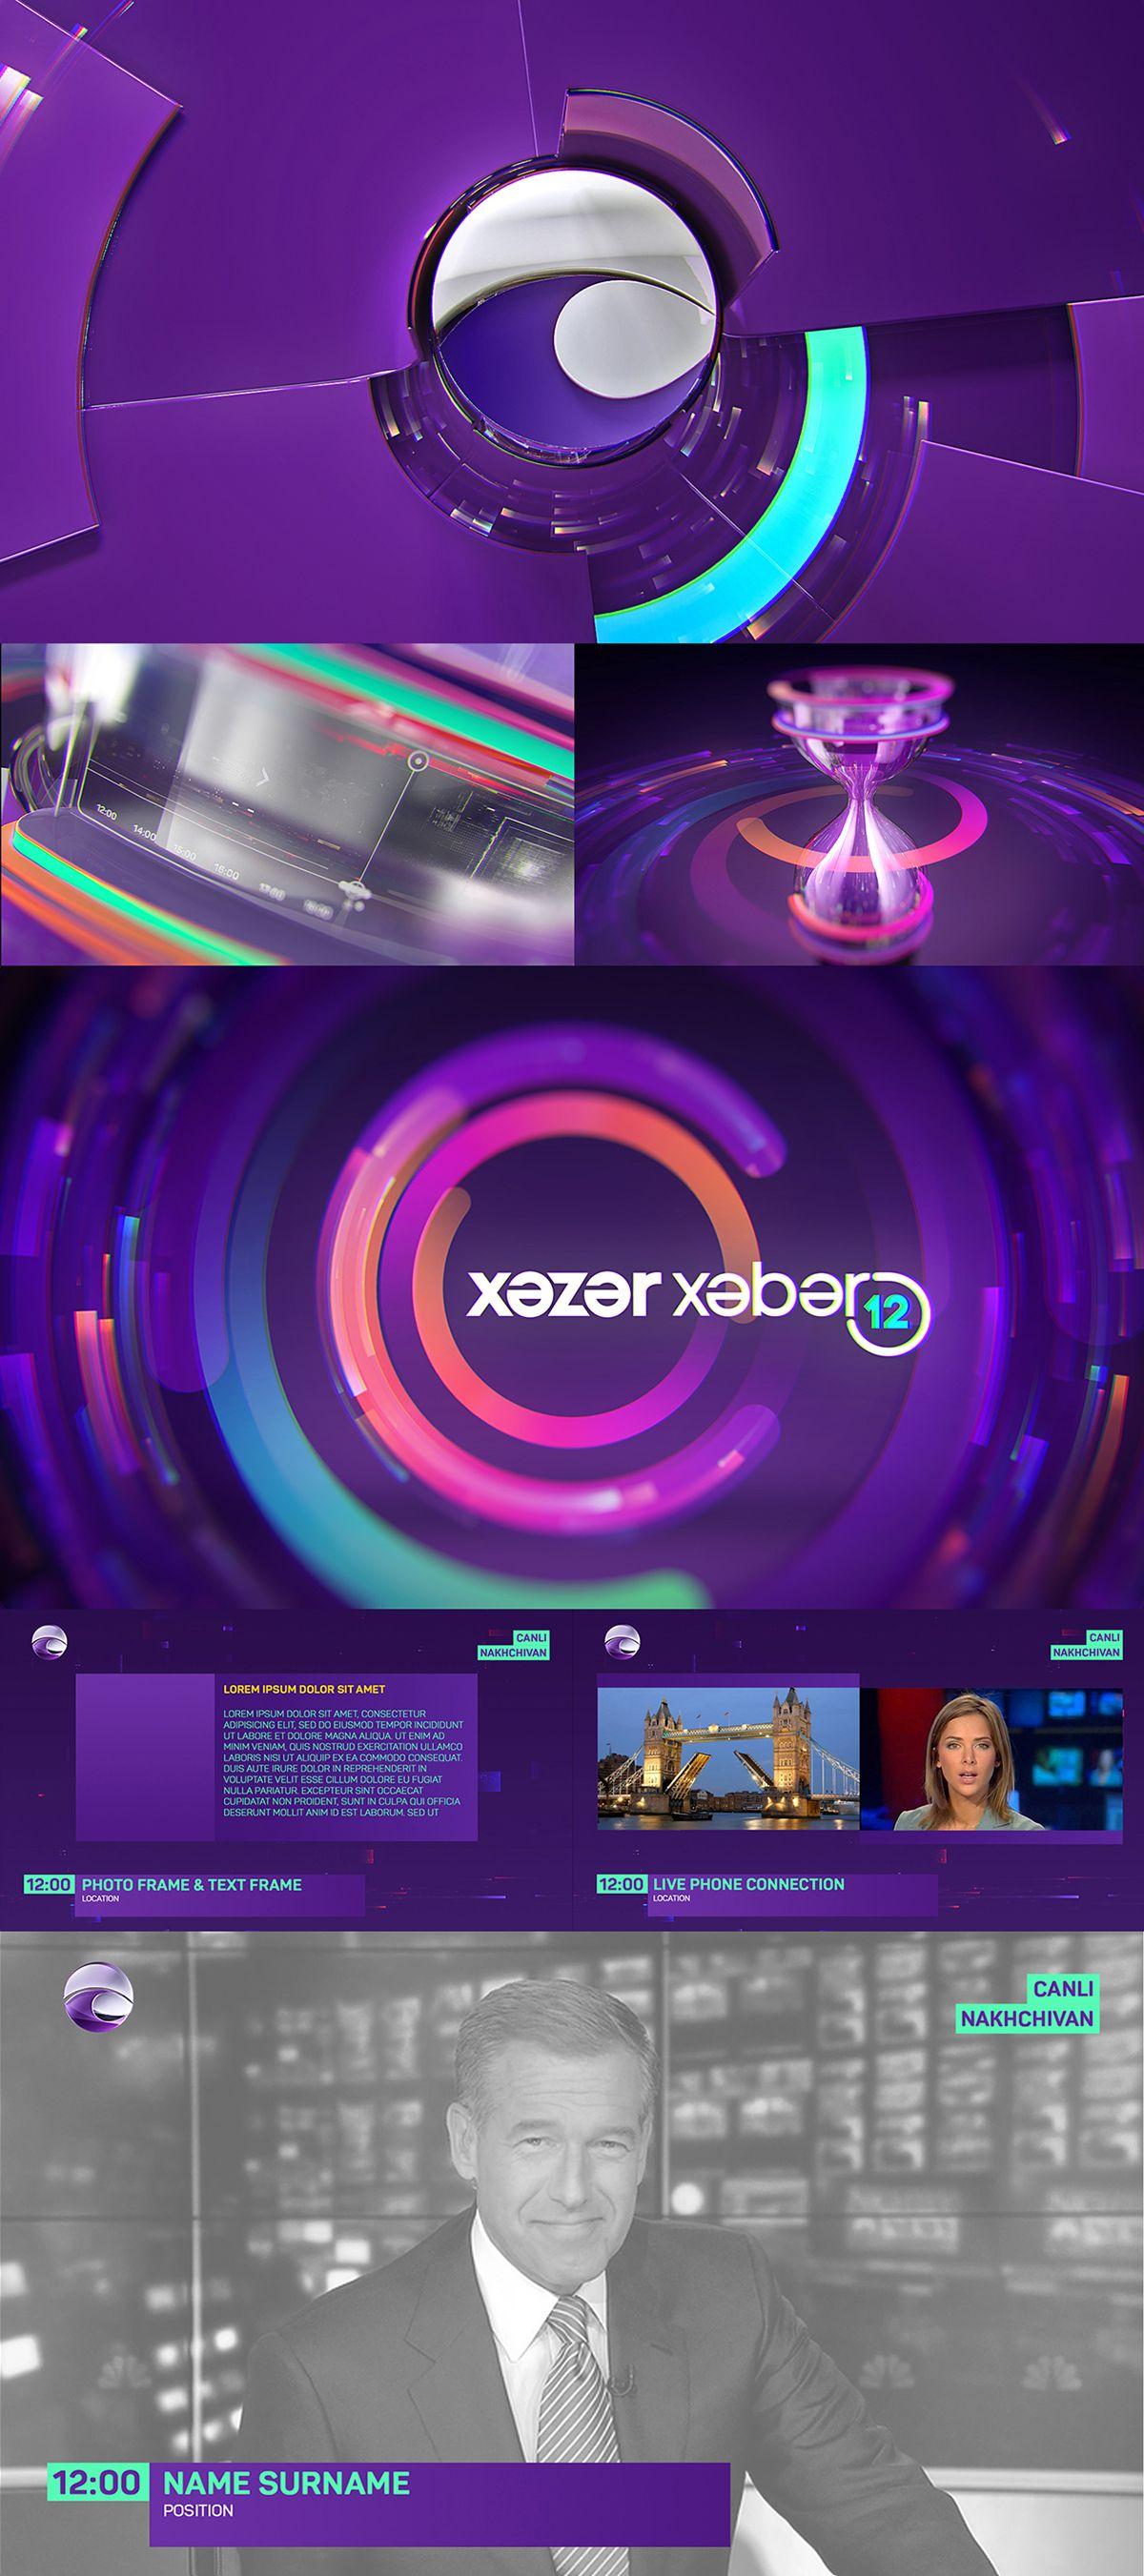 Khazar Channel branding on Behance